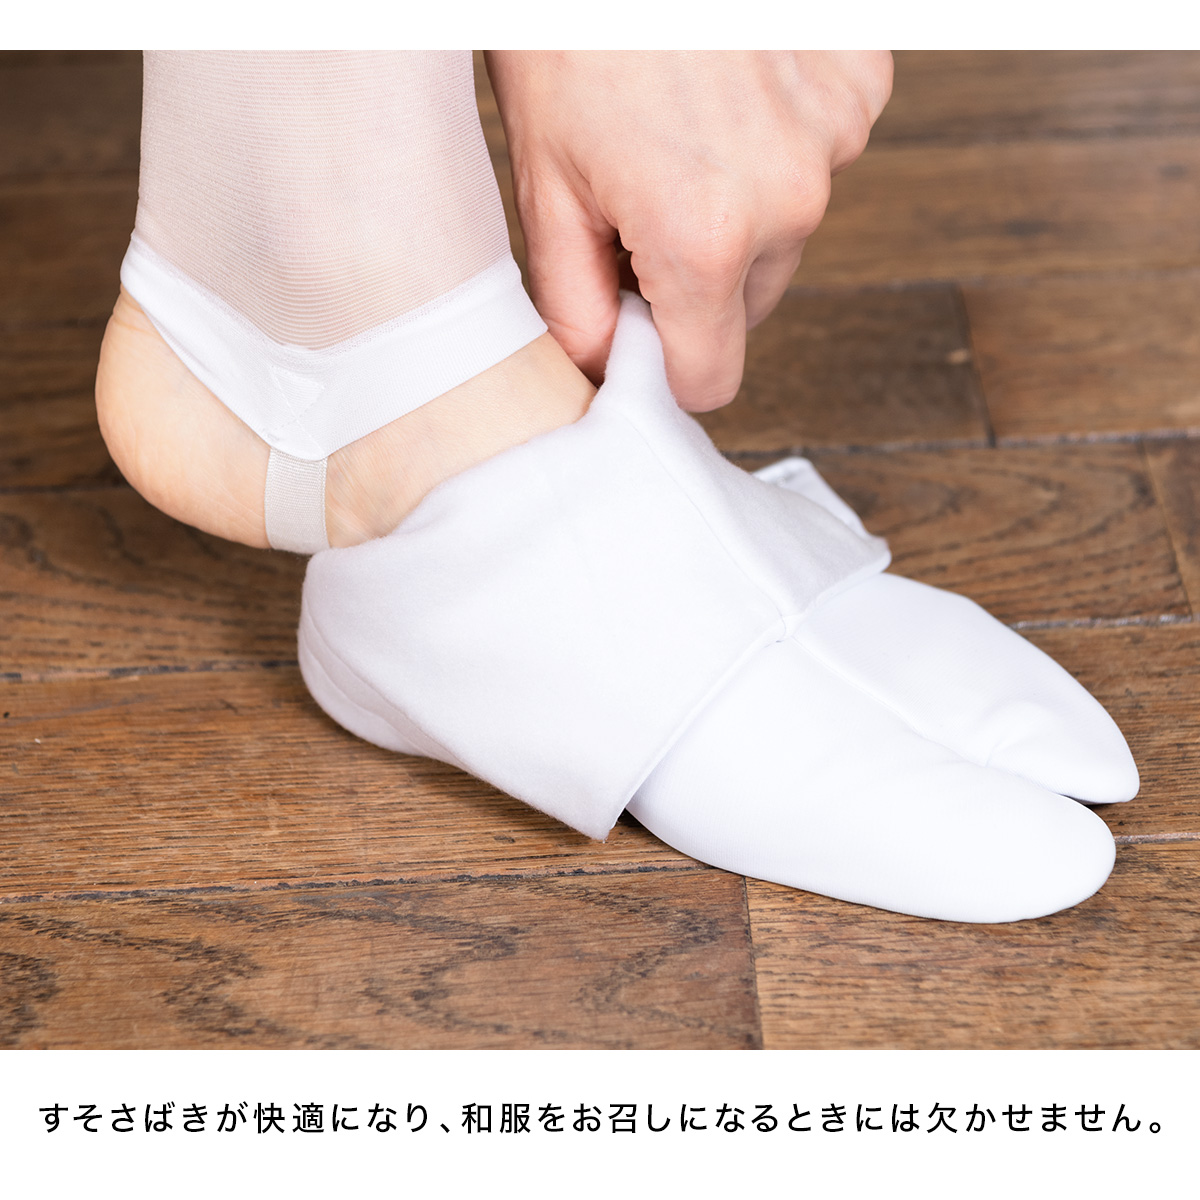 Knee stockings kimono accessory dressing petty person in Japanese dress